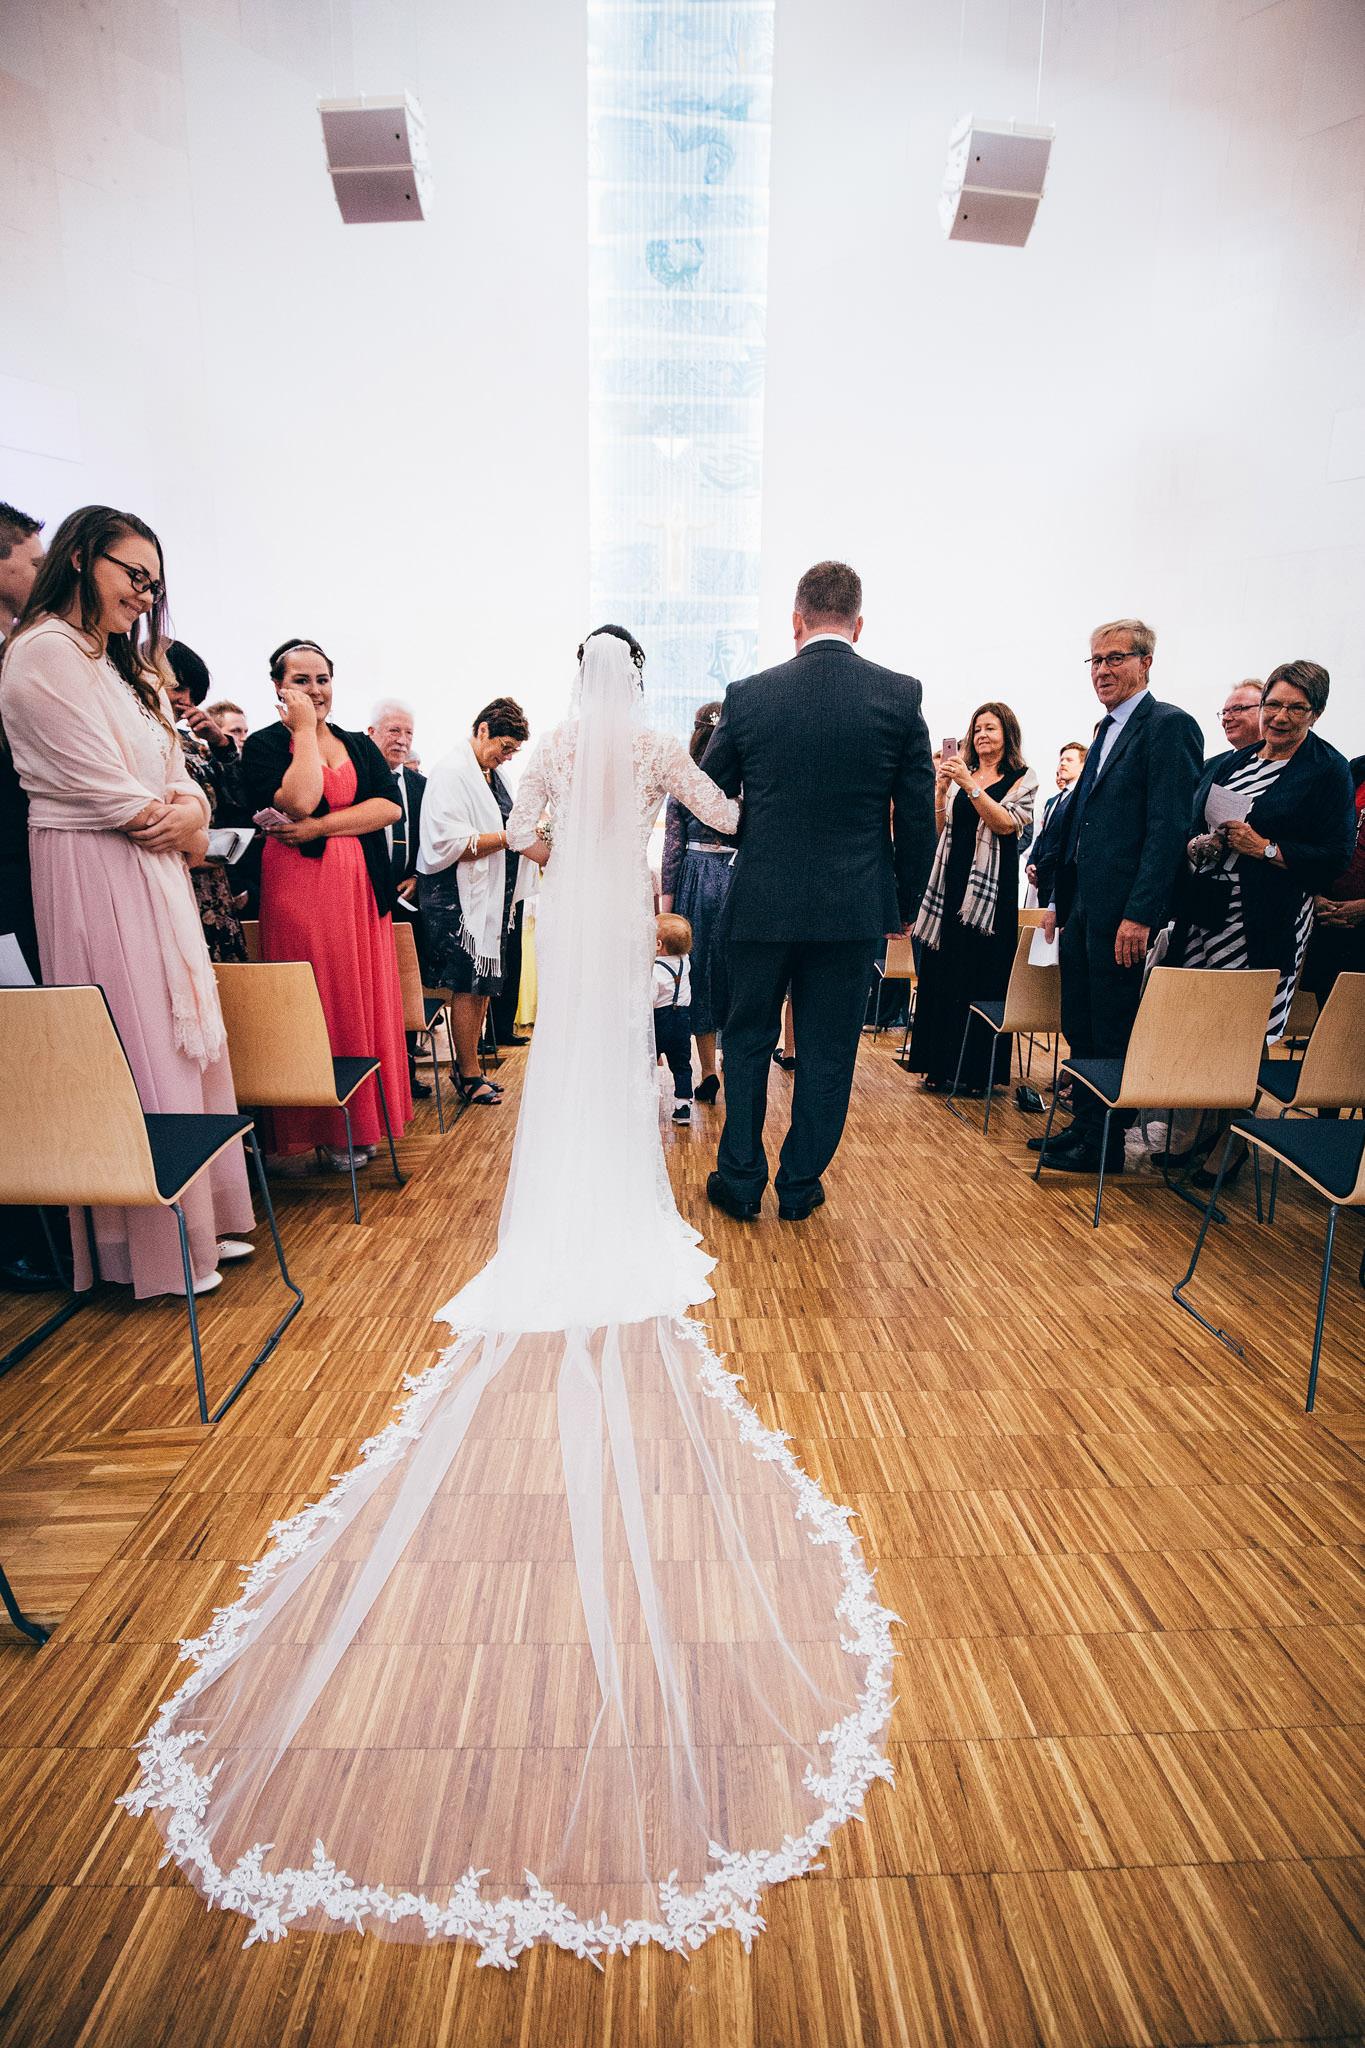 Norway+wedding+photographer+elopement+pre+wedding+Casey+Arneson-33.jpg